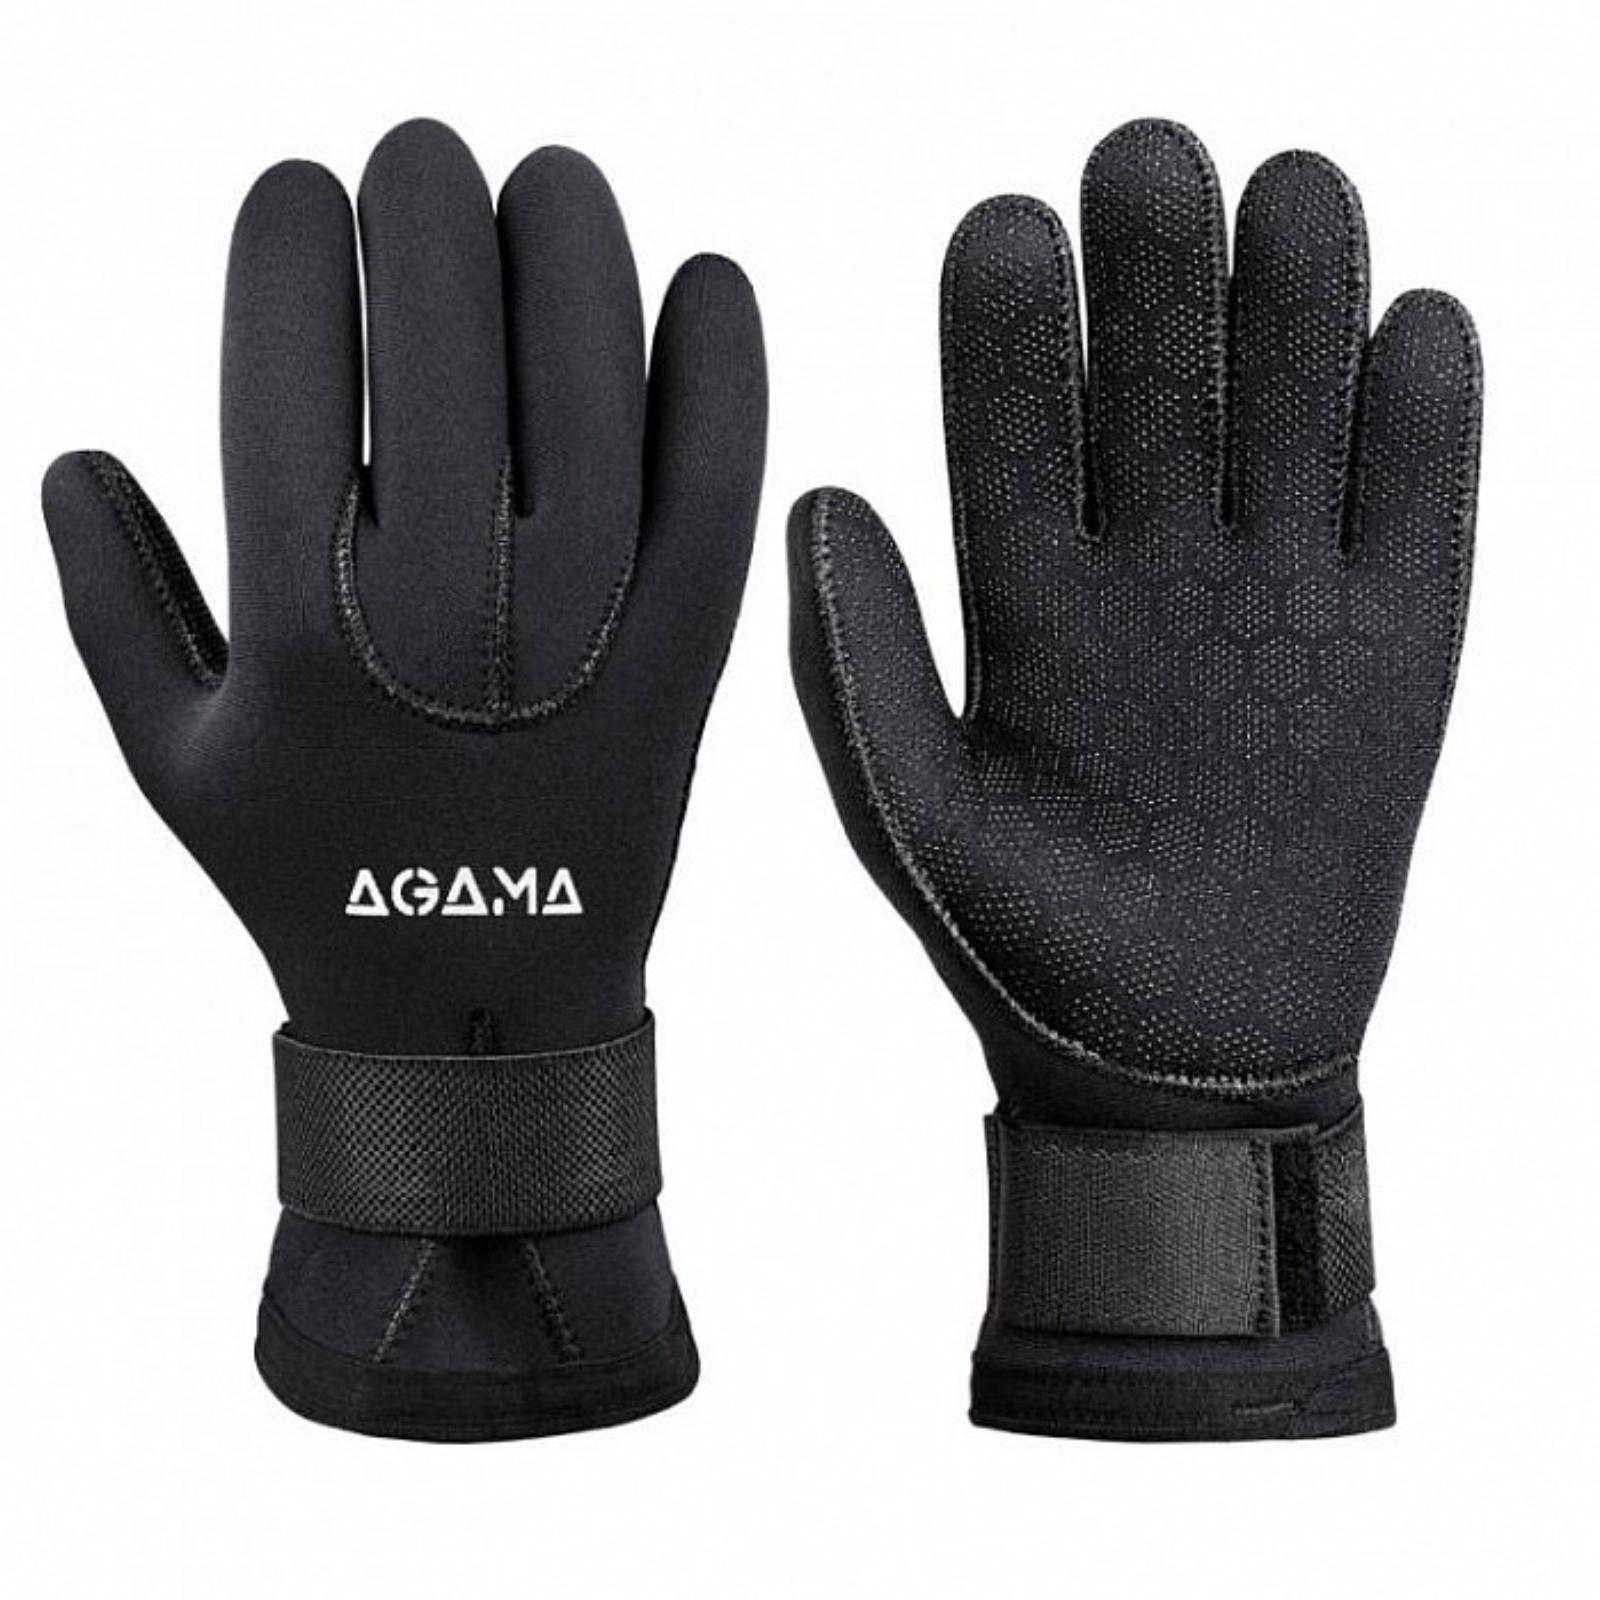 Neoprenové rukavice AGAMA Classic 5 mm - vel. XXL